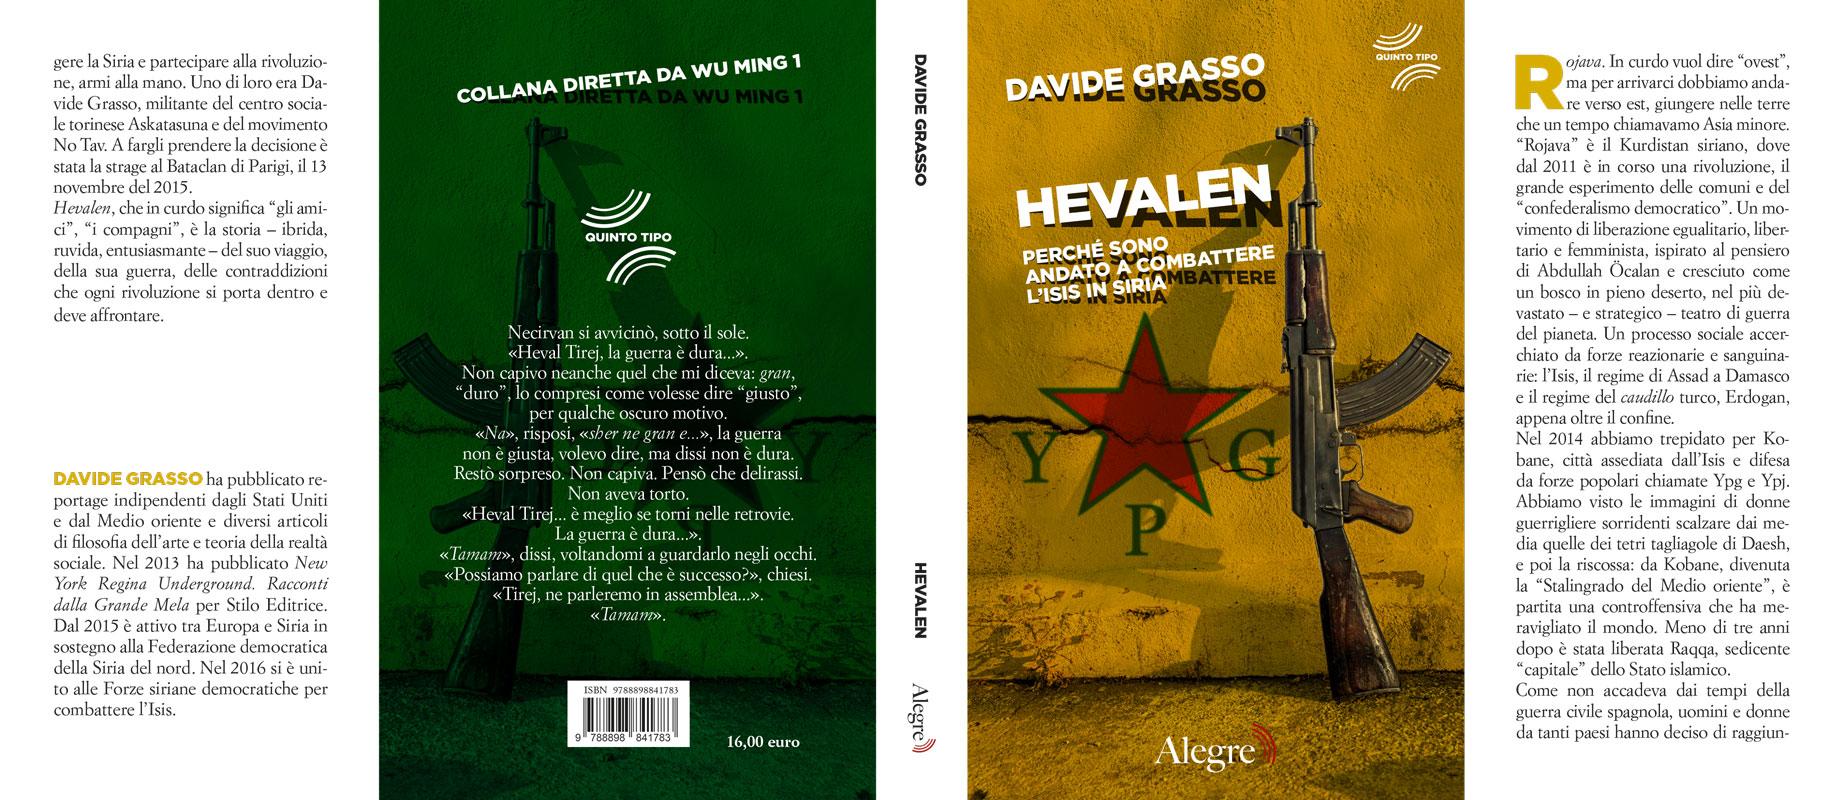 Davide Grasso, Hevalen, stesa